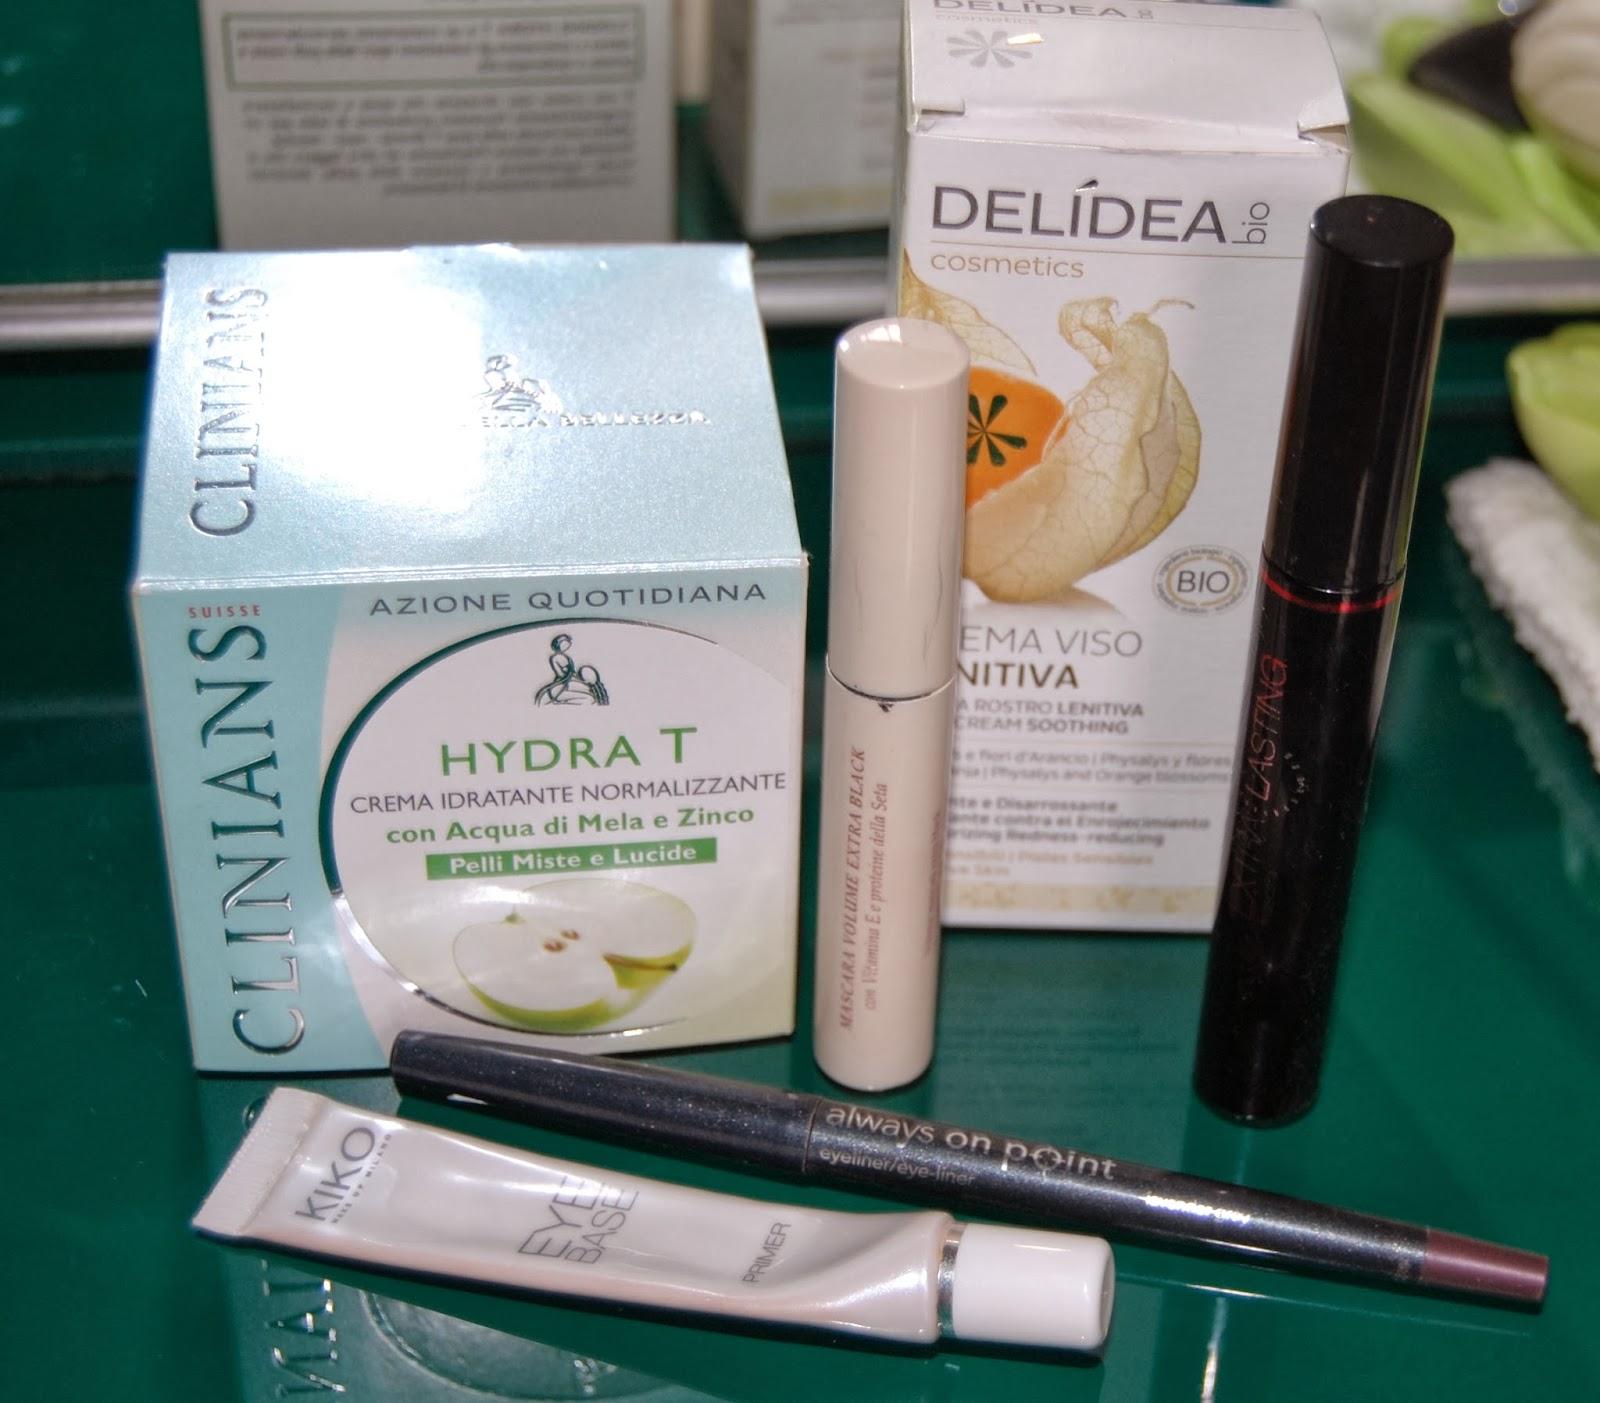 Clinians, Delidea, Bottega Verde, Avon, Kiko